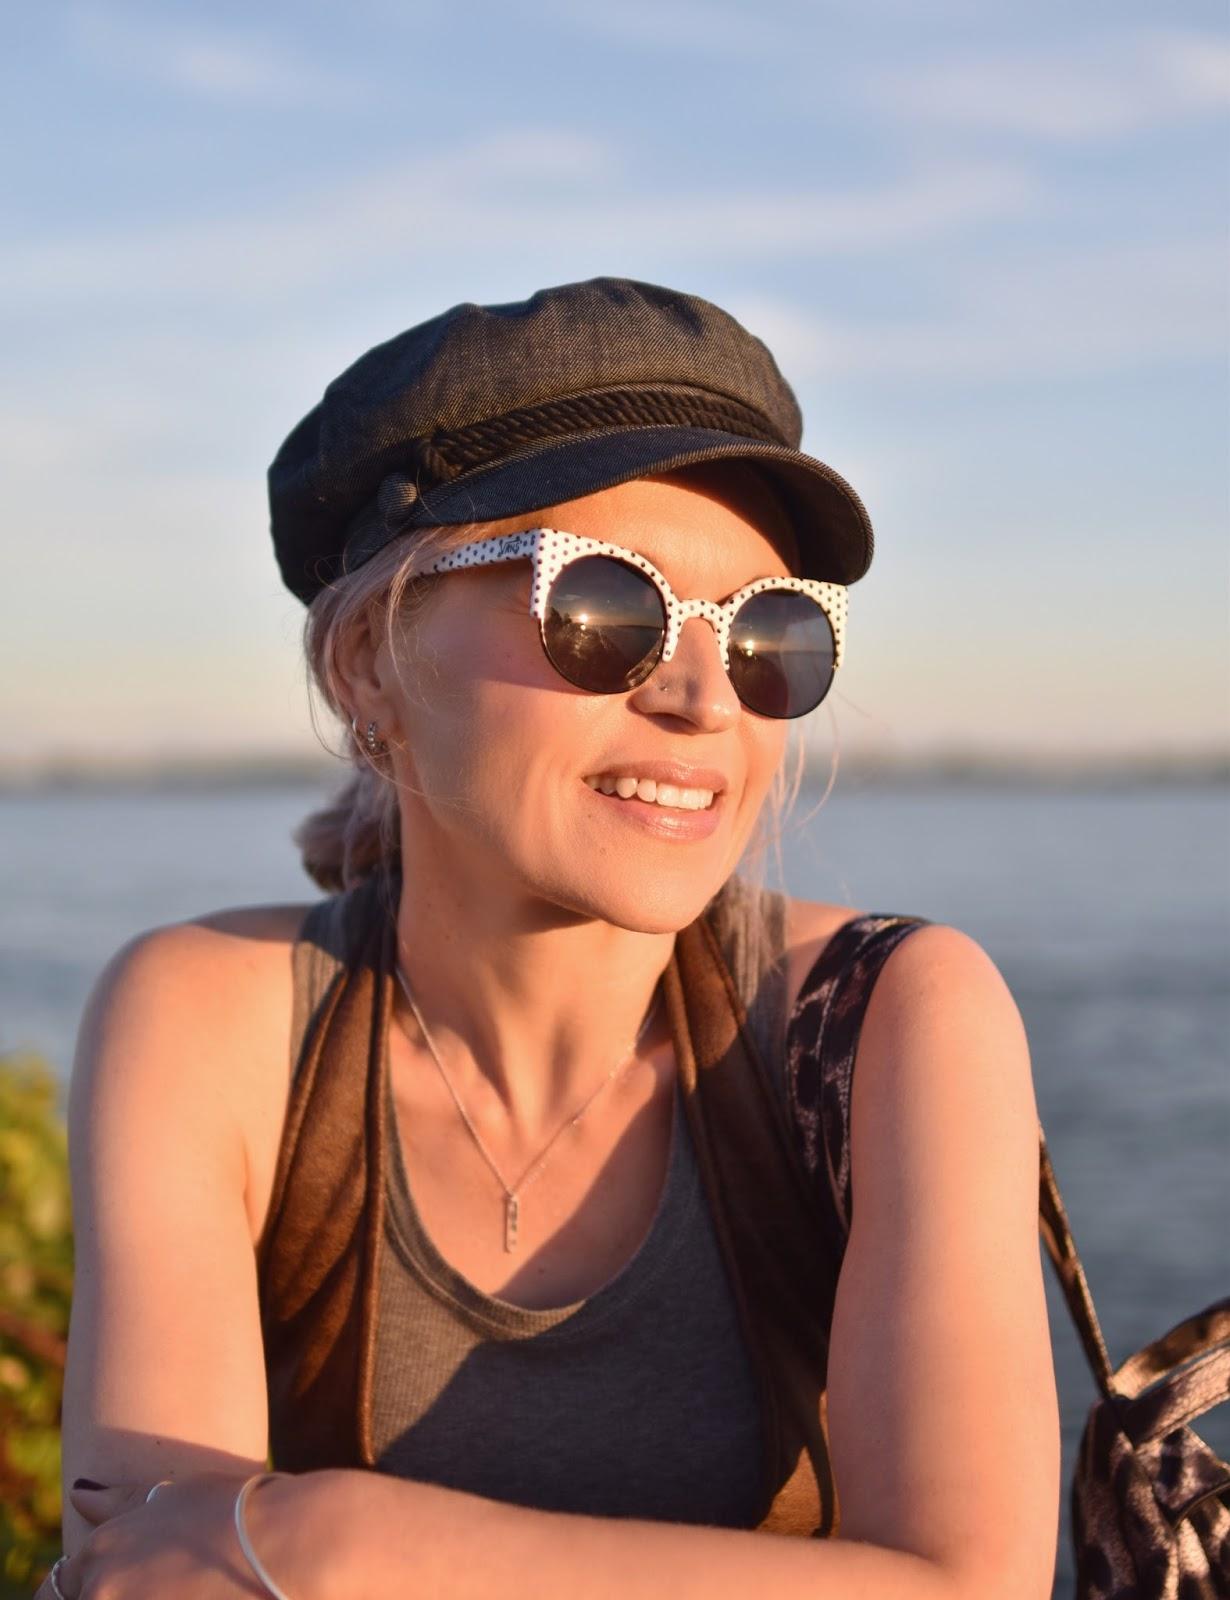 Monika Faulkner outfit inspiration - baker boy cap, Vans polka-dot sunglasses